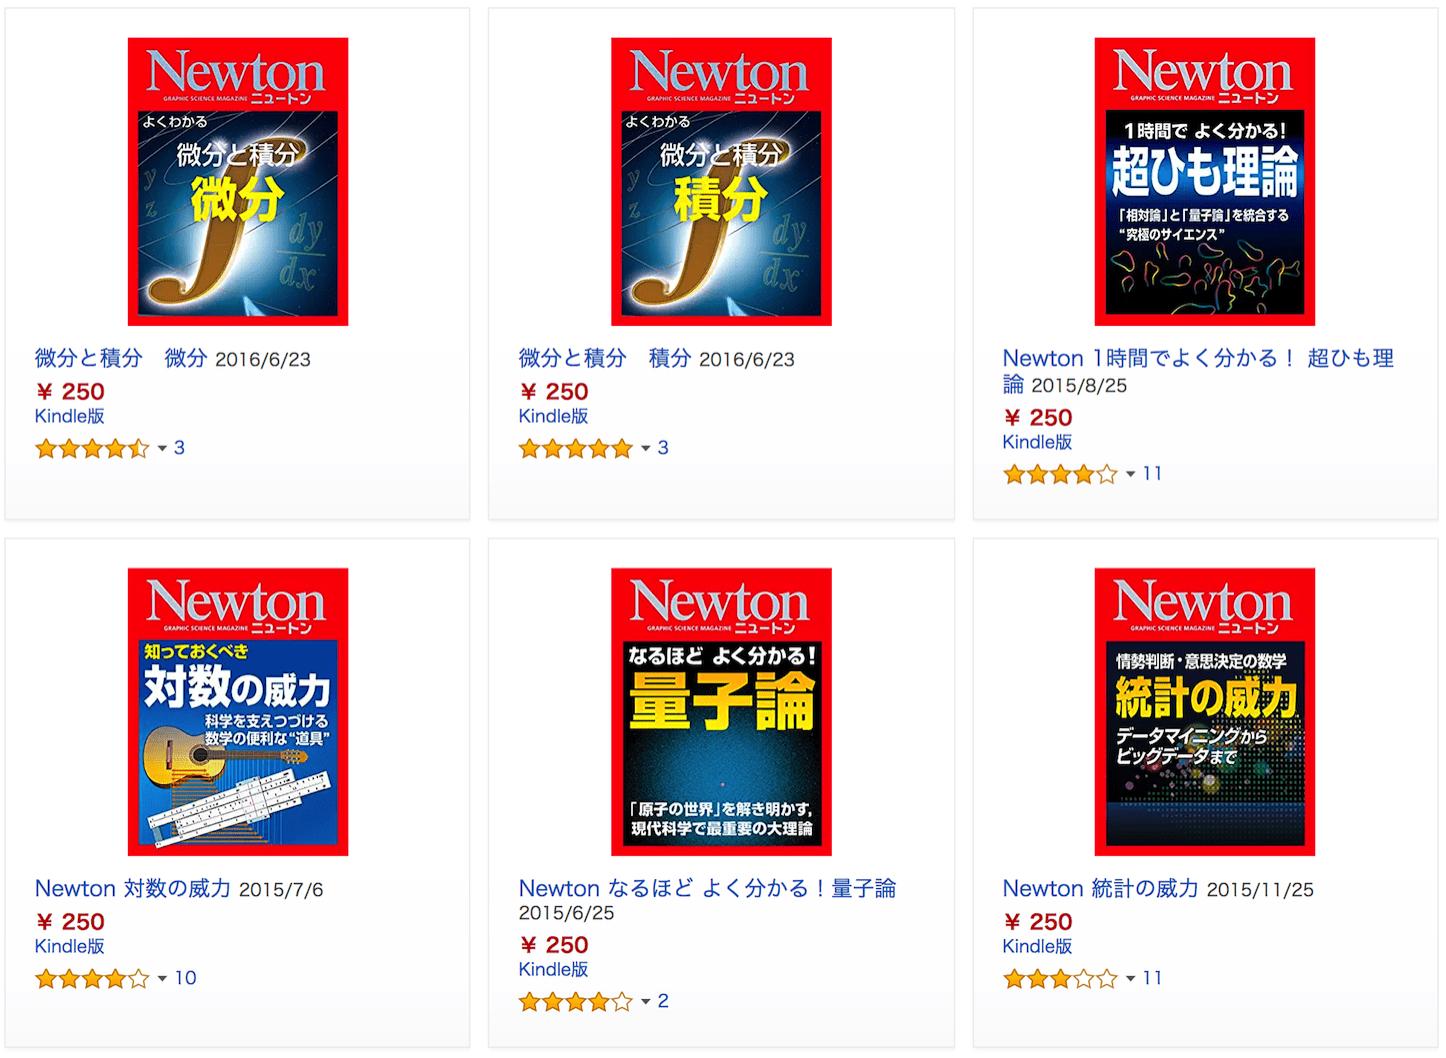 Newton Sale